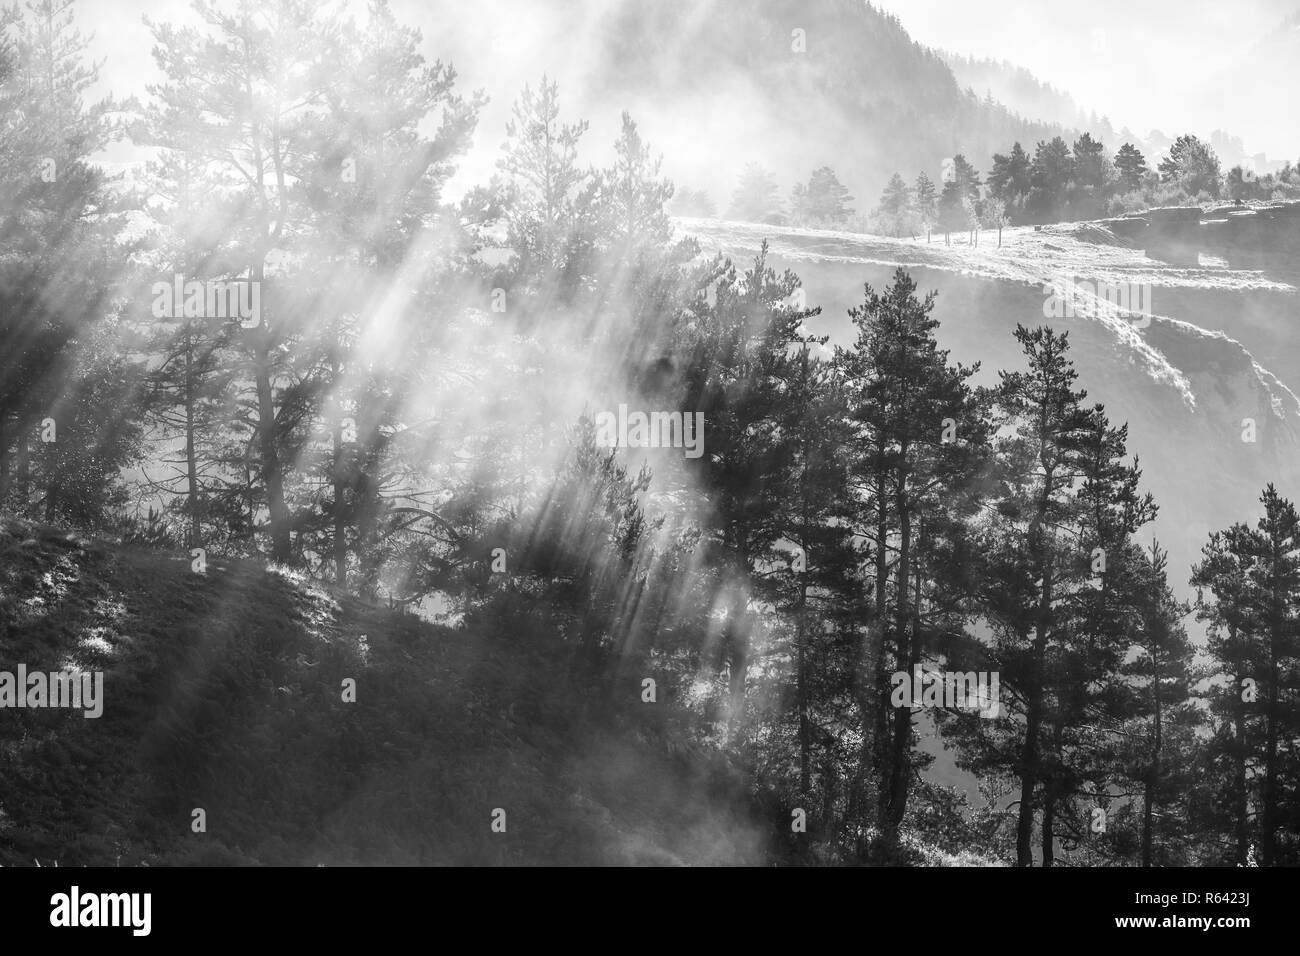 Morning mist in the forest, sun's rays breaking through the fog, Georgia, Tusheti - Stock Image